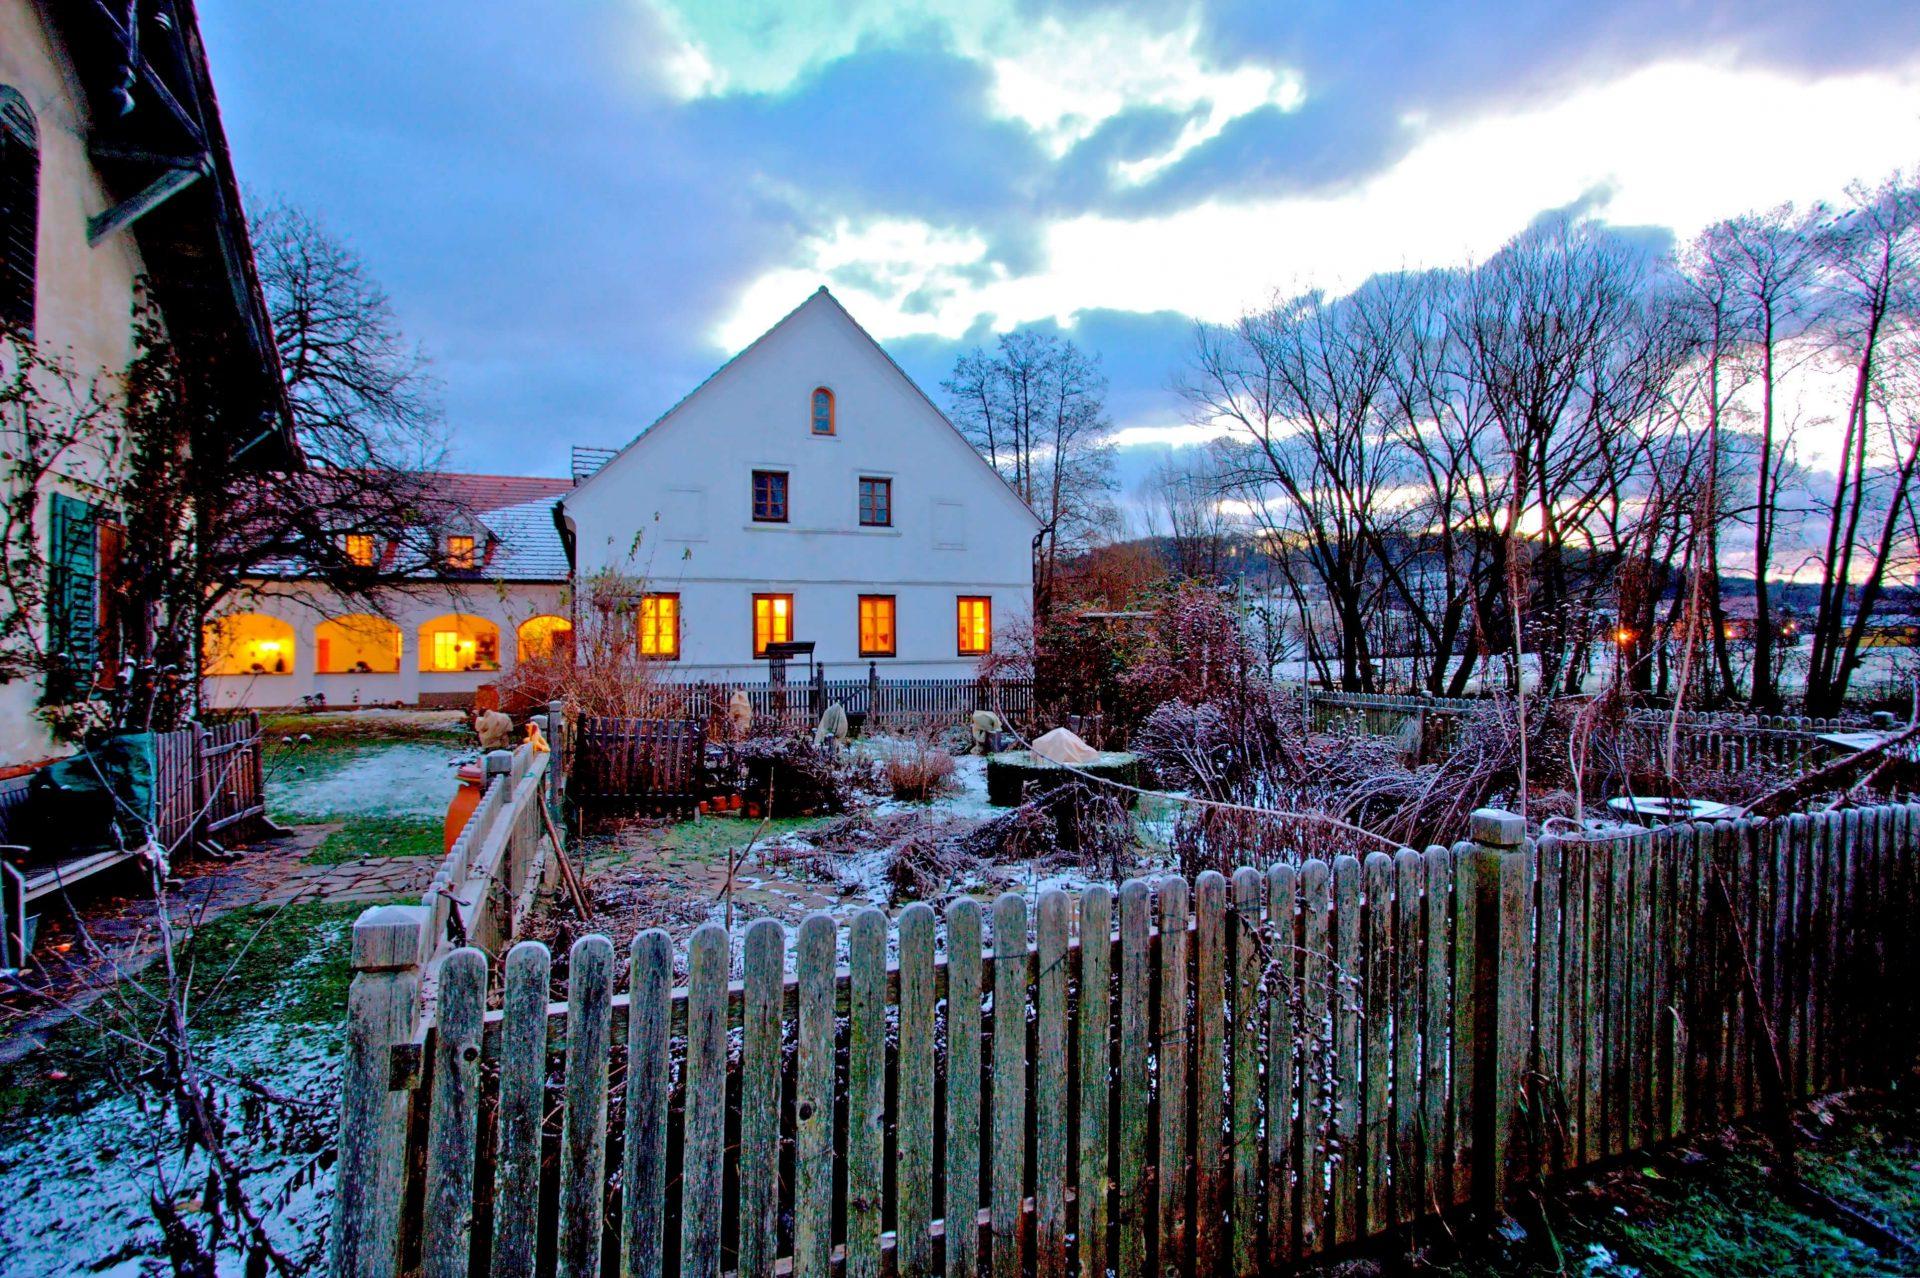 Winterfoto Naturidyll Hotel Landhofmühle